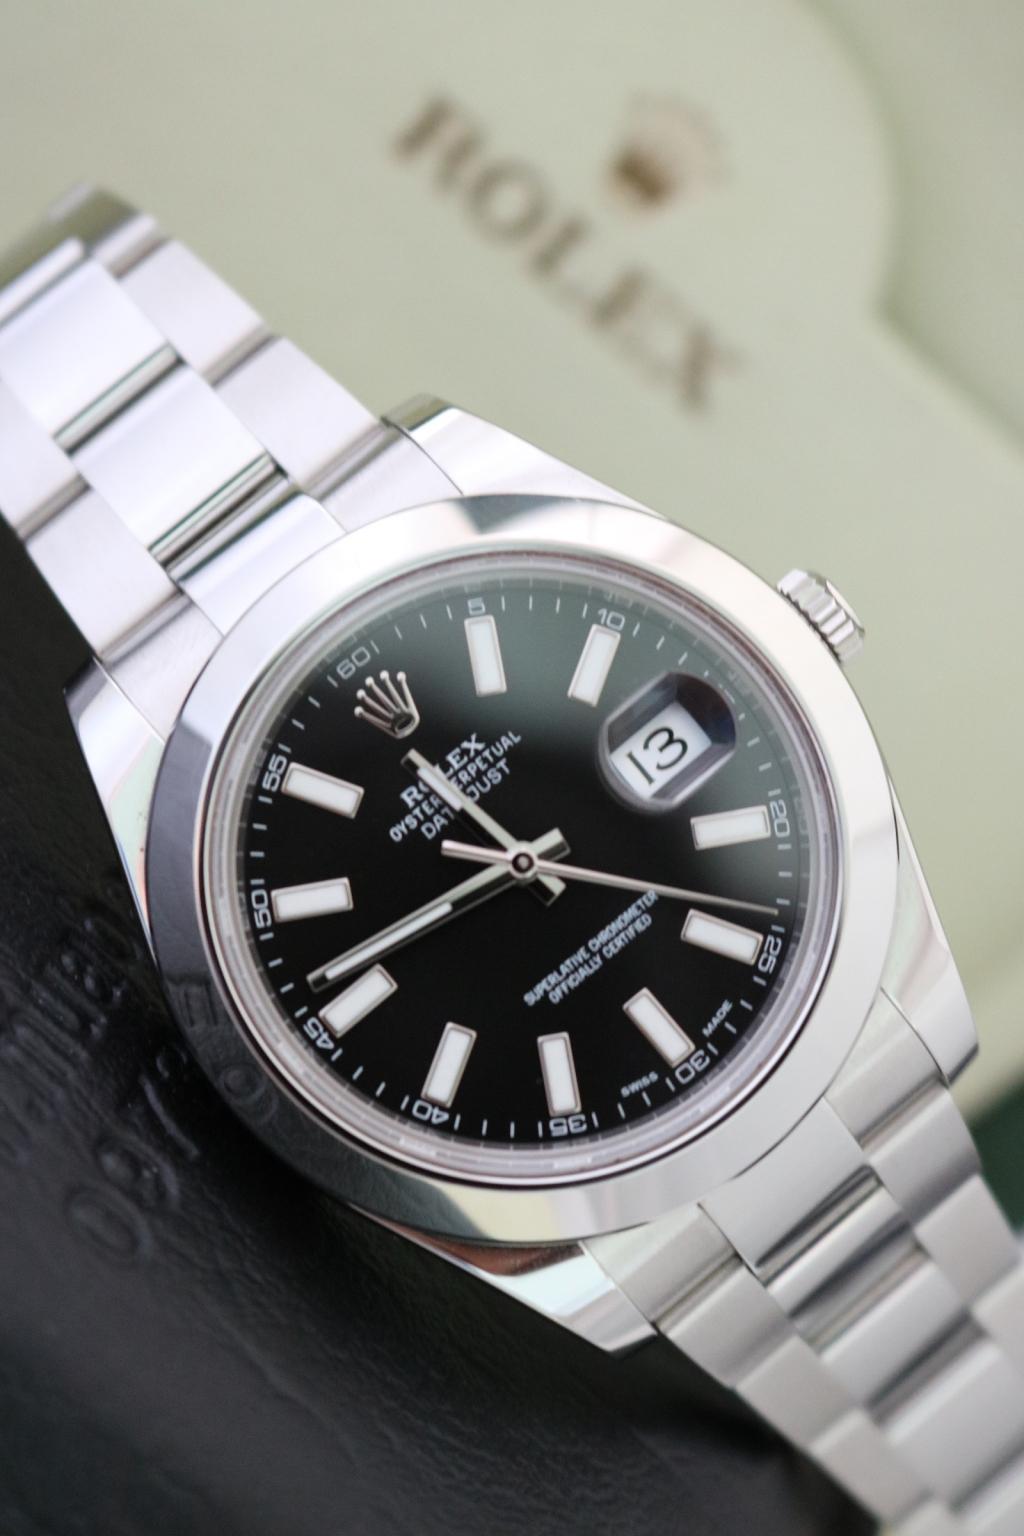 Đồng hồ rolex datejust 6 số Nam 116300 – Inox – Size 41mm – Đầy đủ giấy tờ